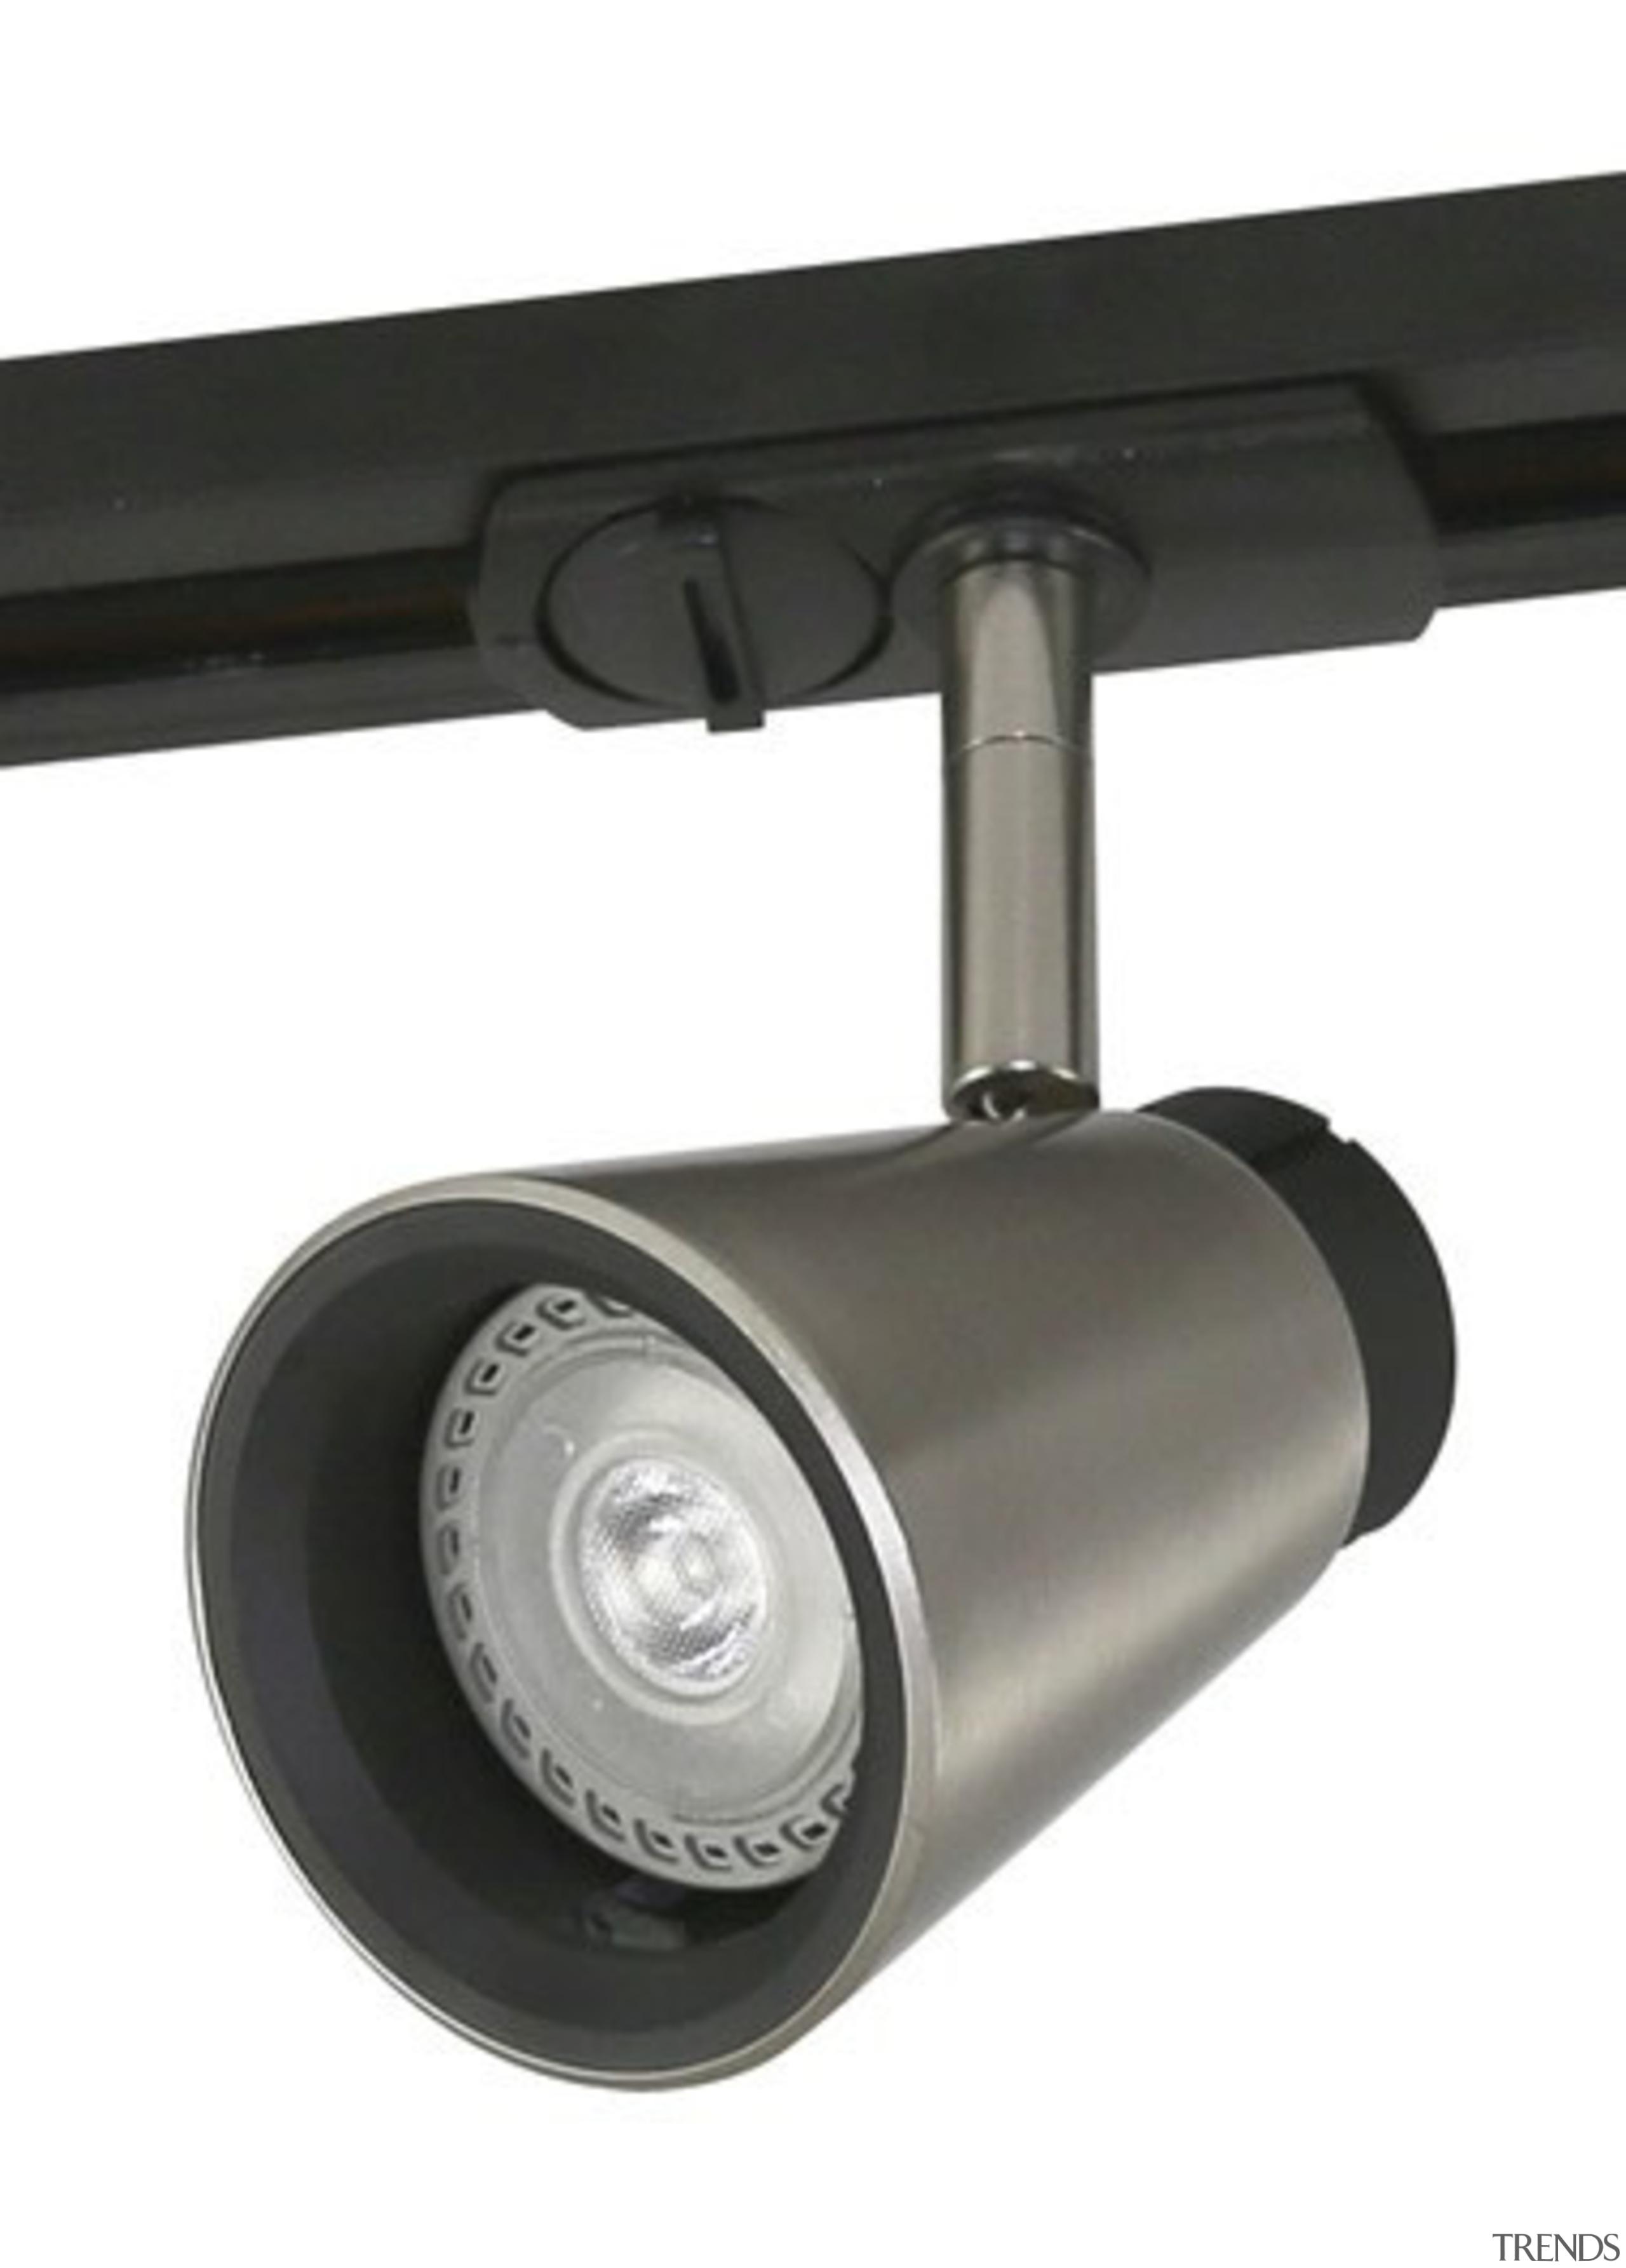 FeaturesThe Zoom track spotlight is an innovative minimalist hardware, lighting, product design, white, black